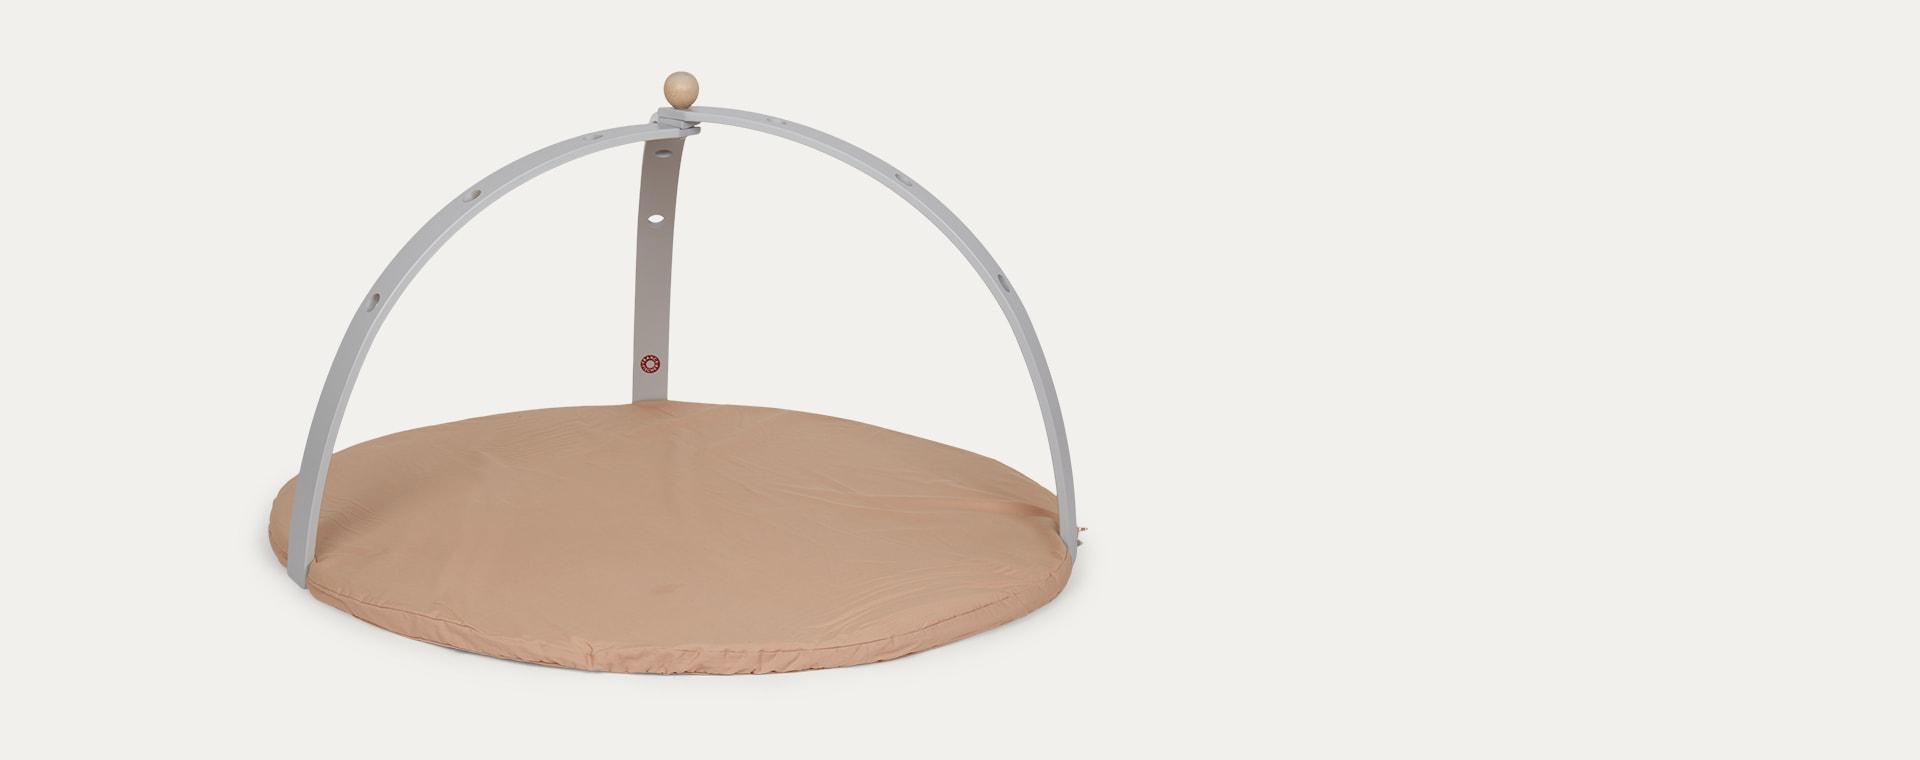 Grey Franck & Fischer Foldable Play Gym